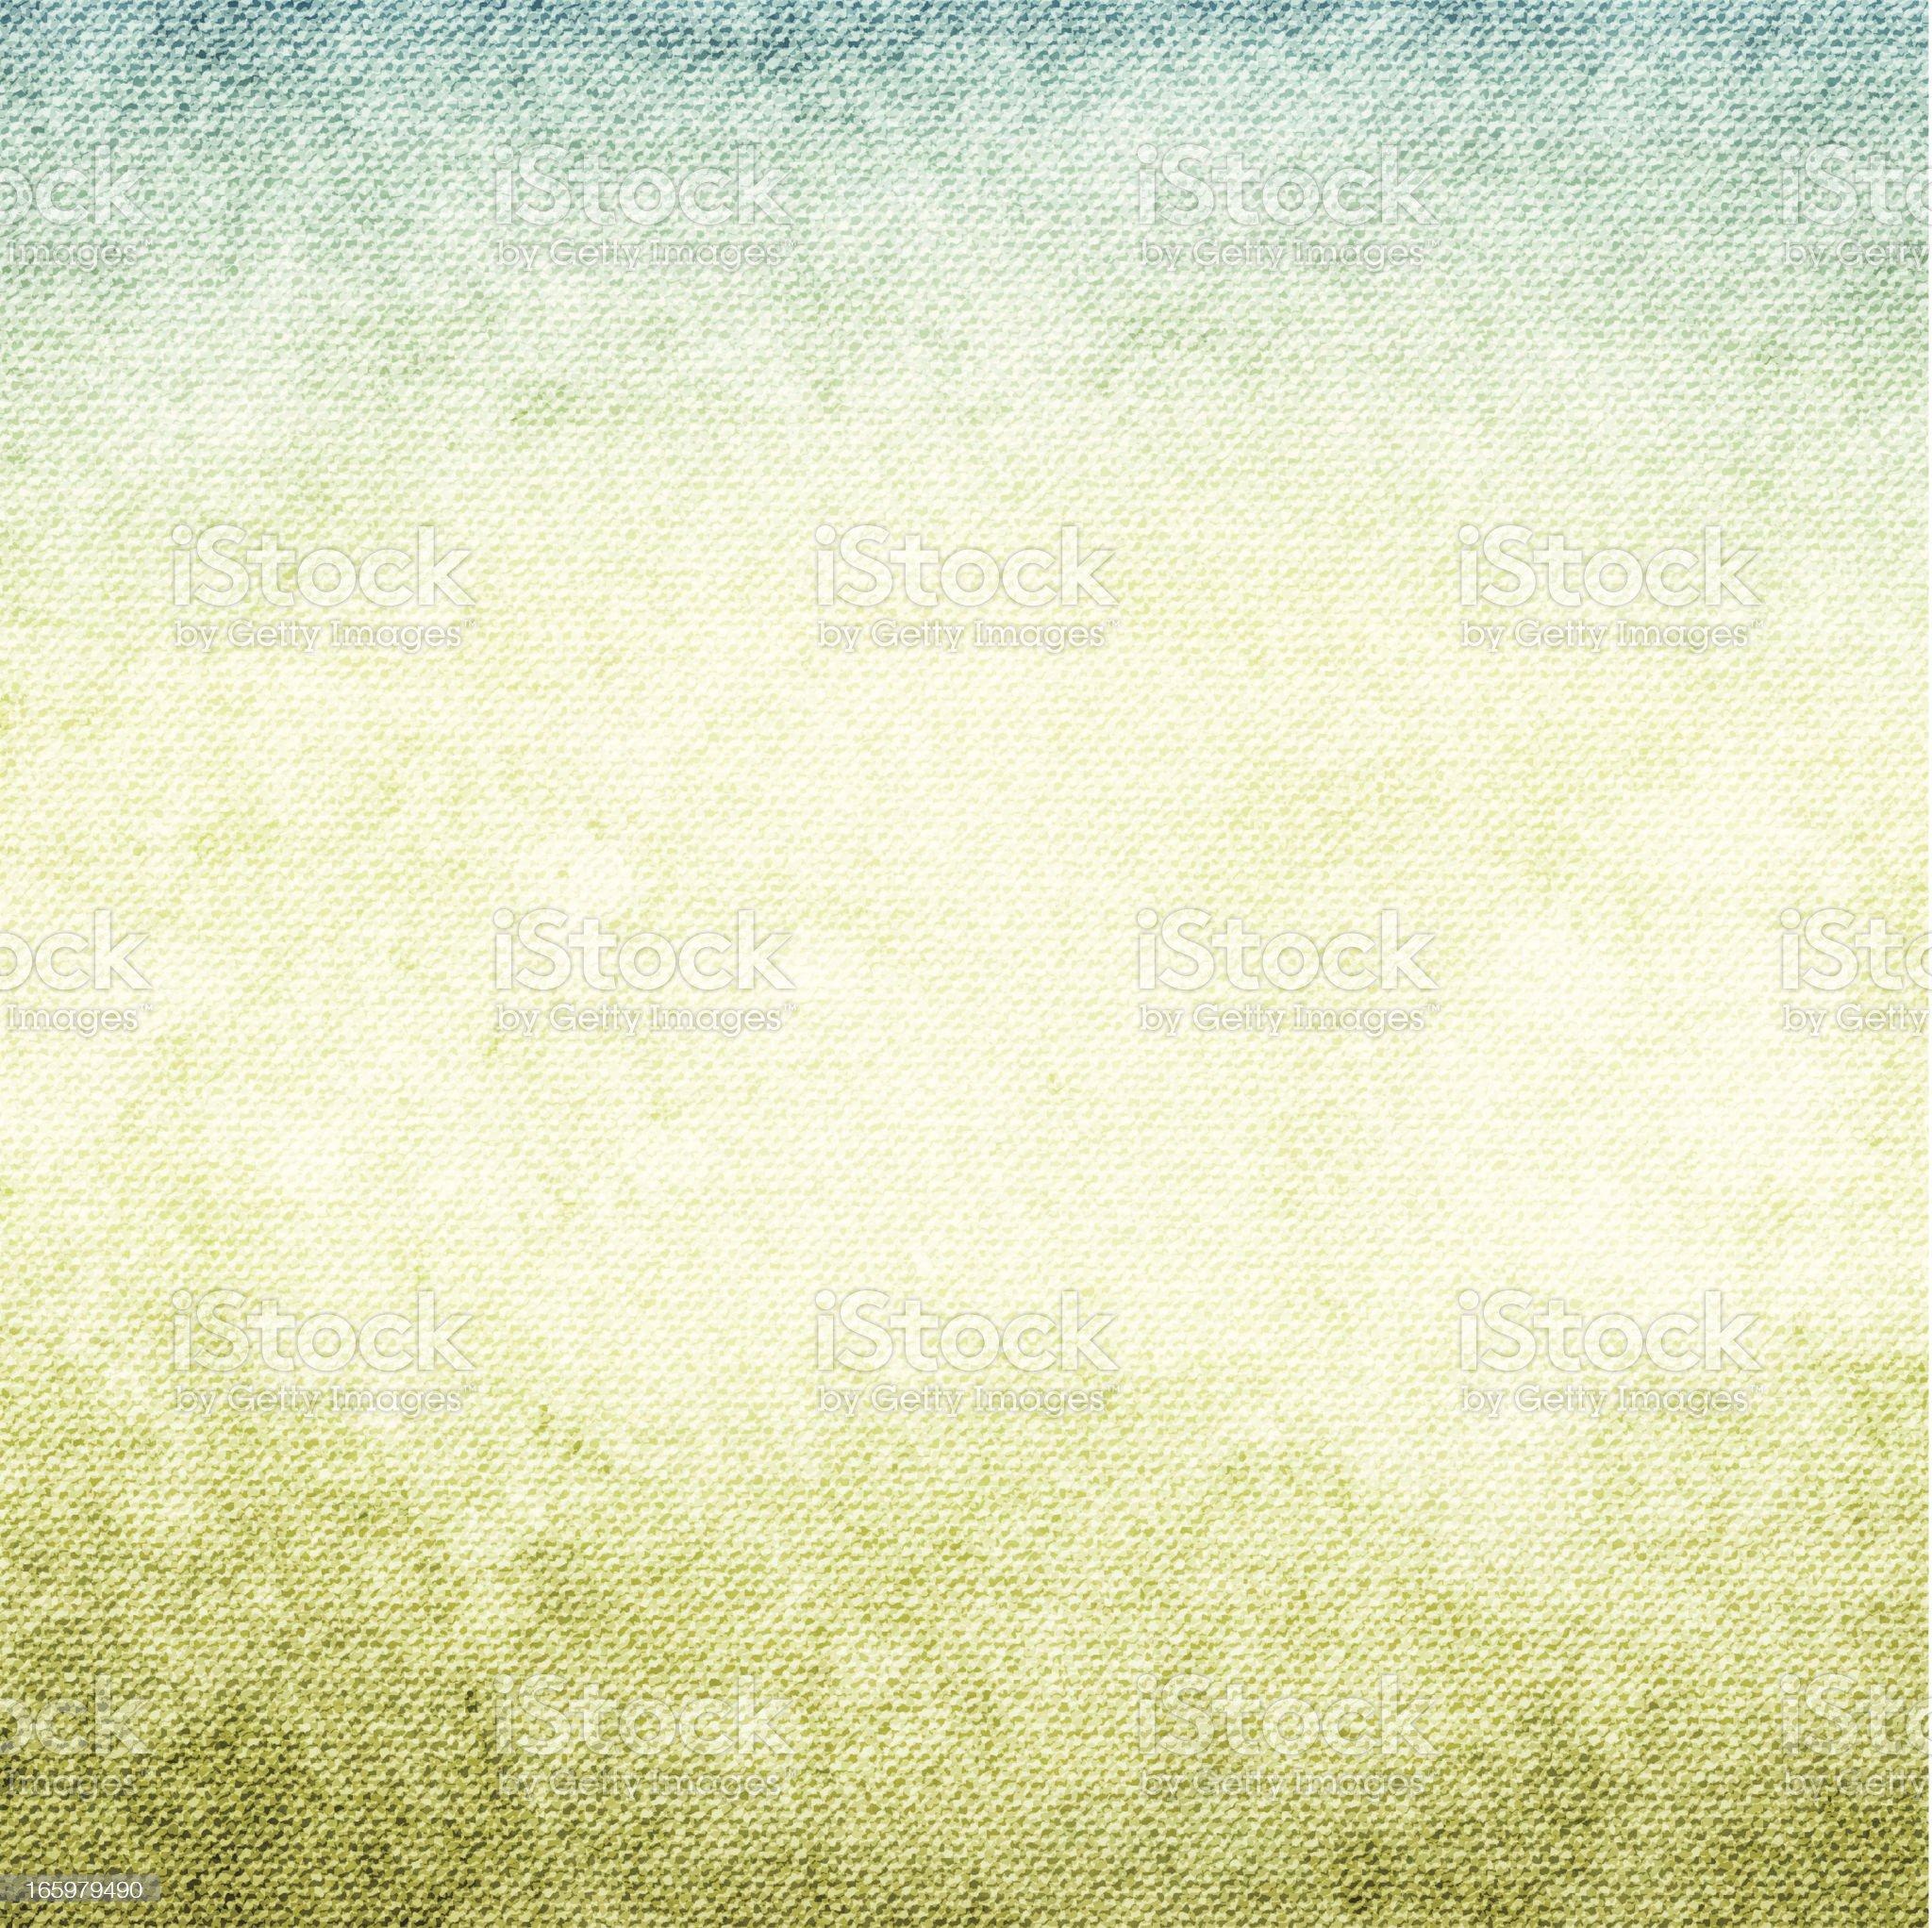 Beige grunge canvas background royalty-free stock vector art